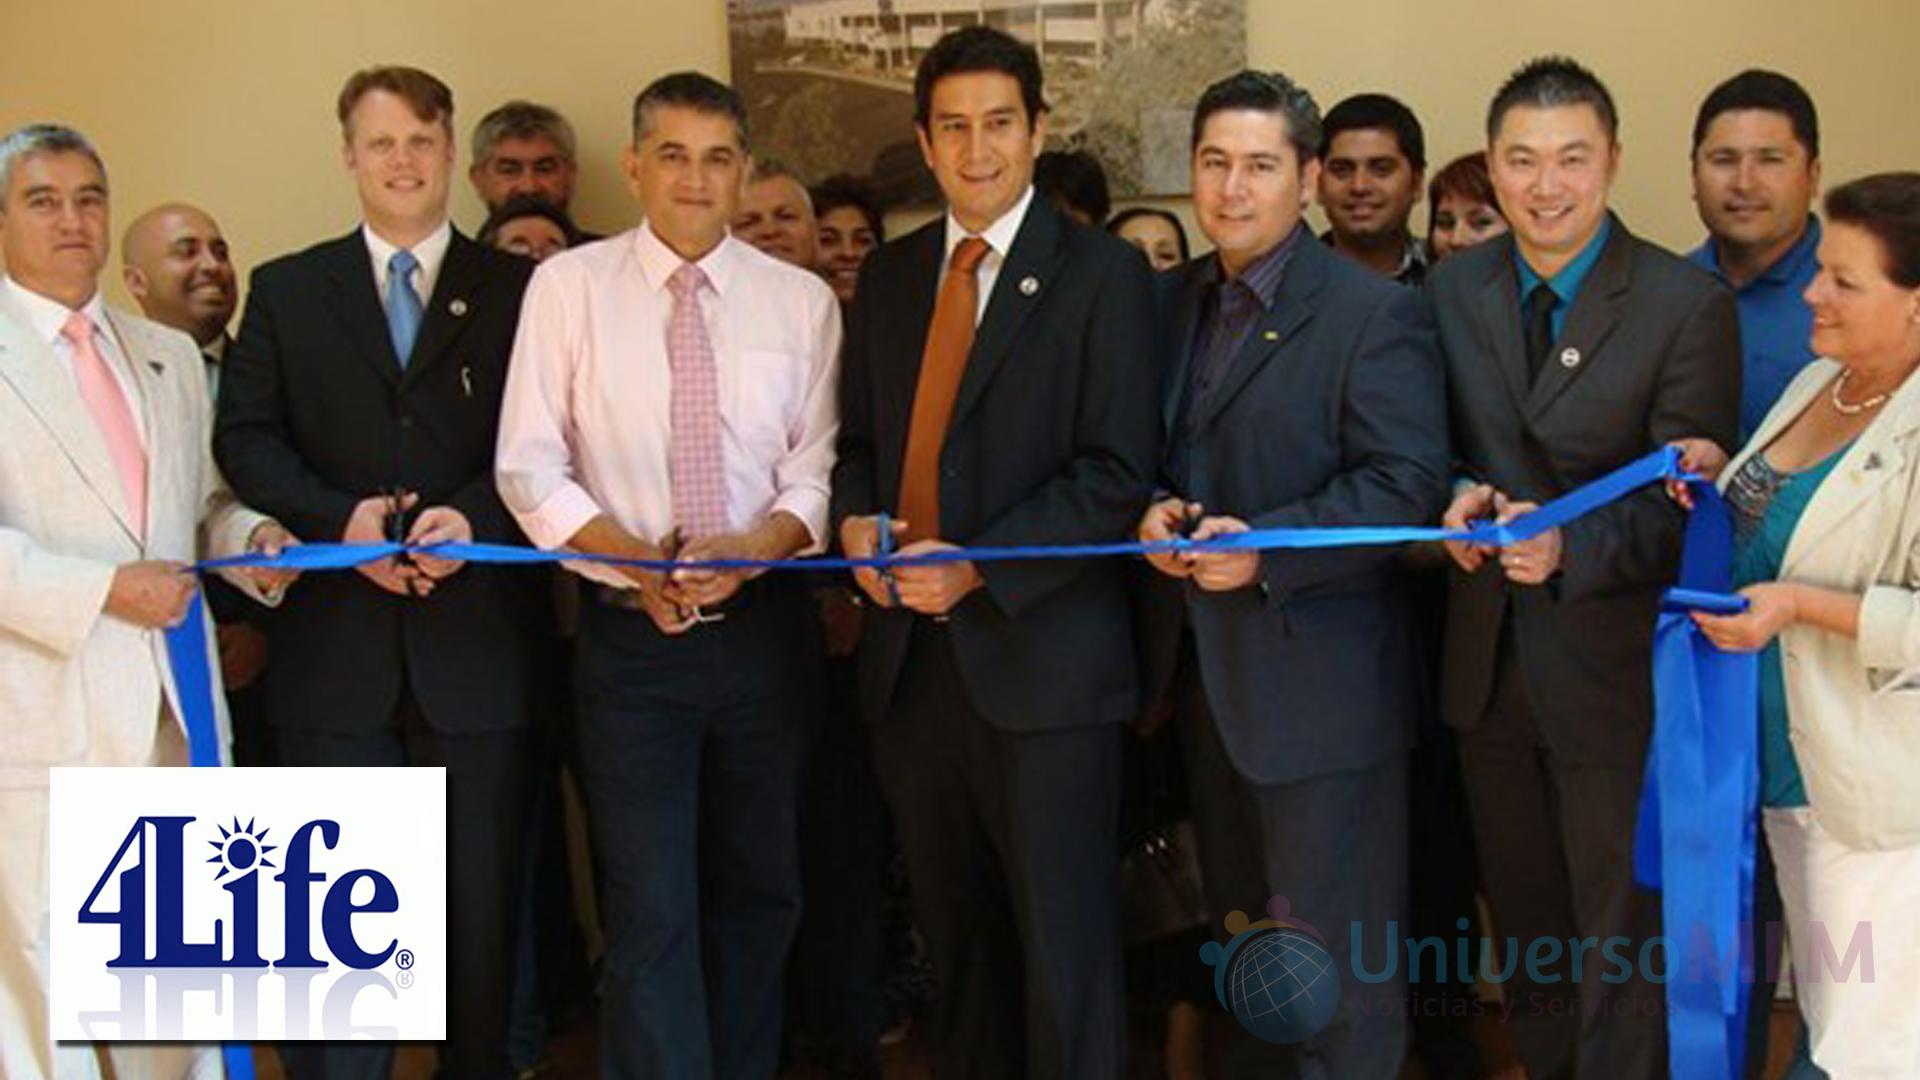 Corte de cinta en oficinas de 4Life en Ecuador